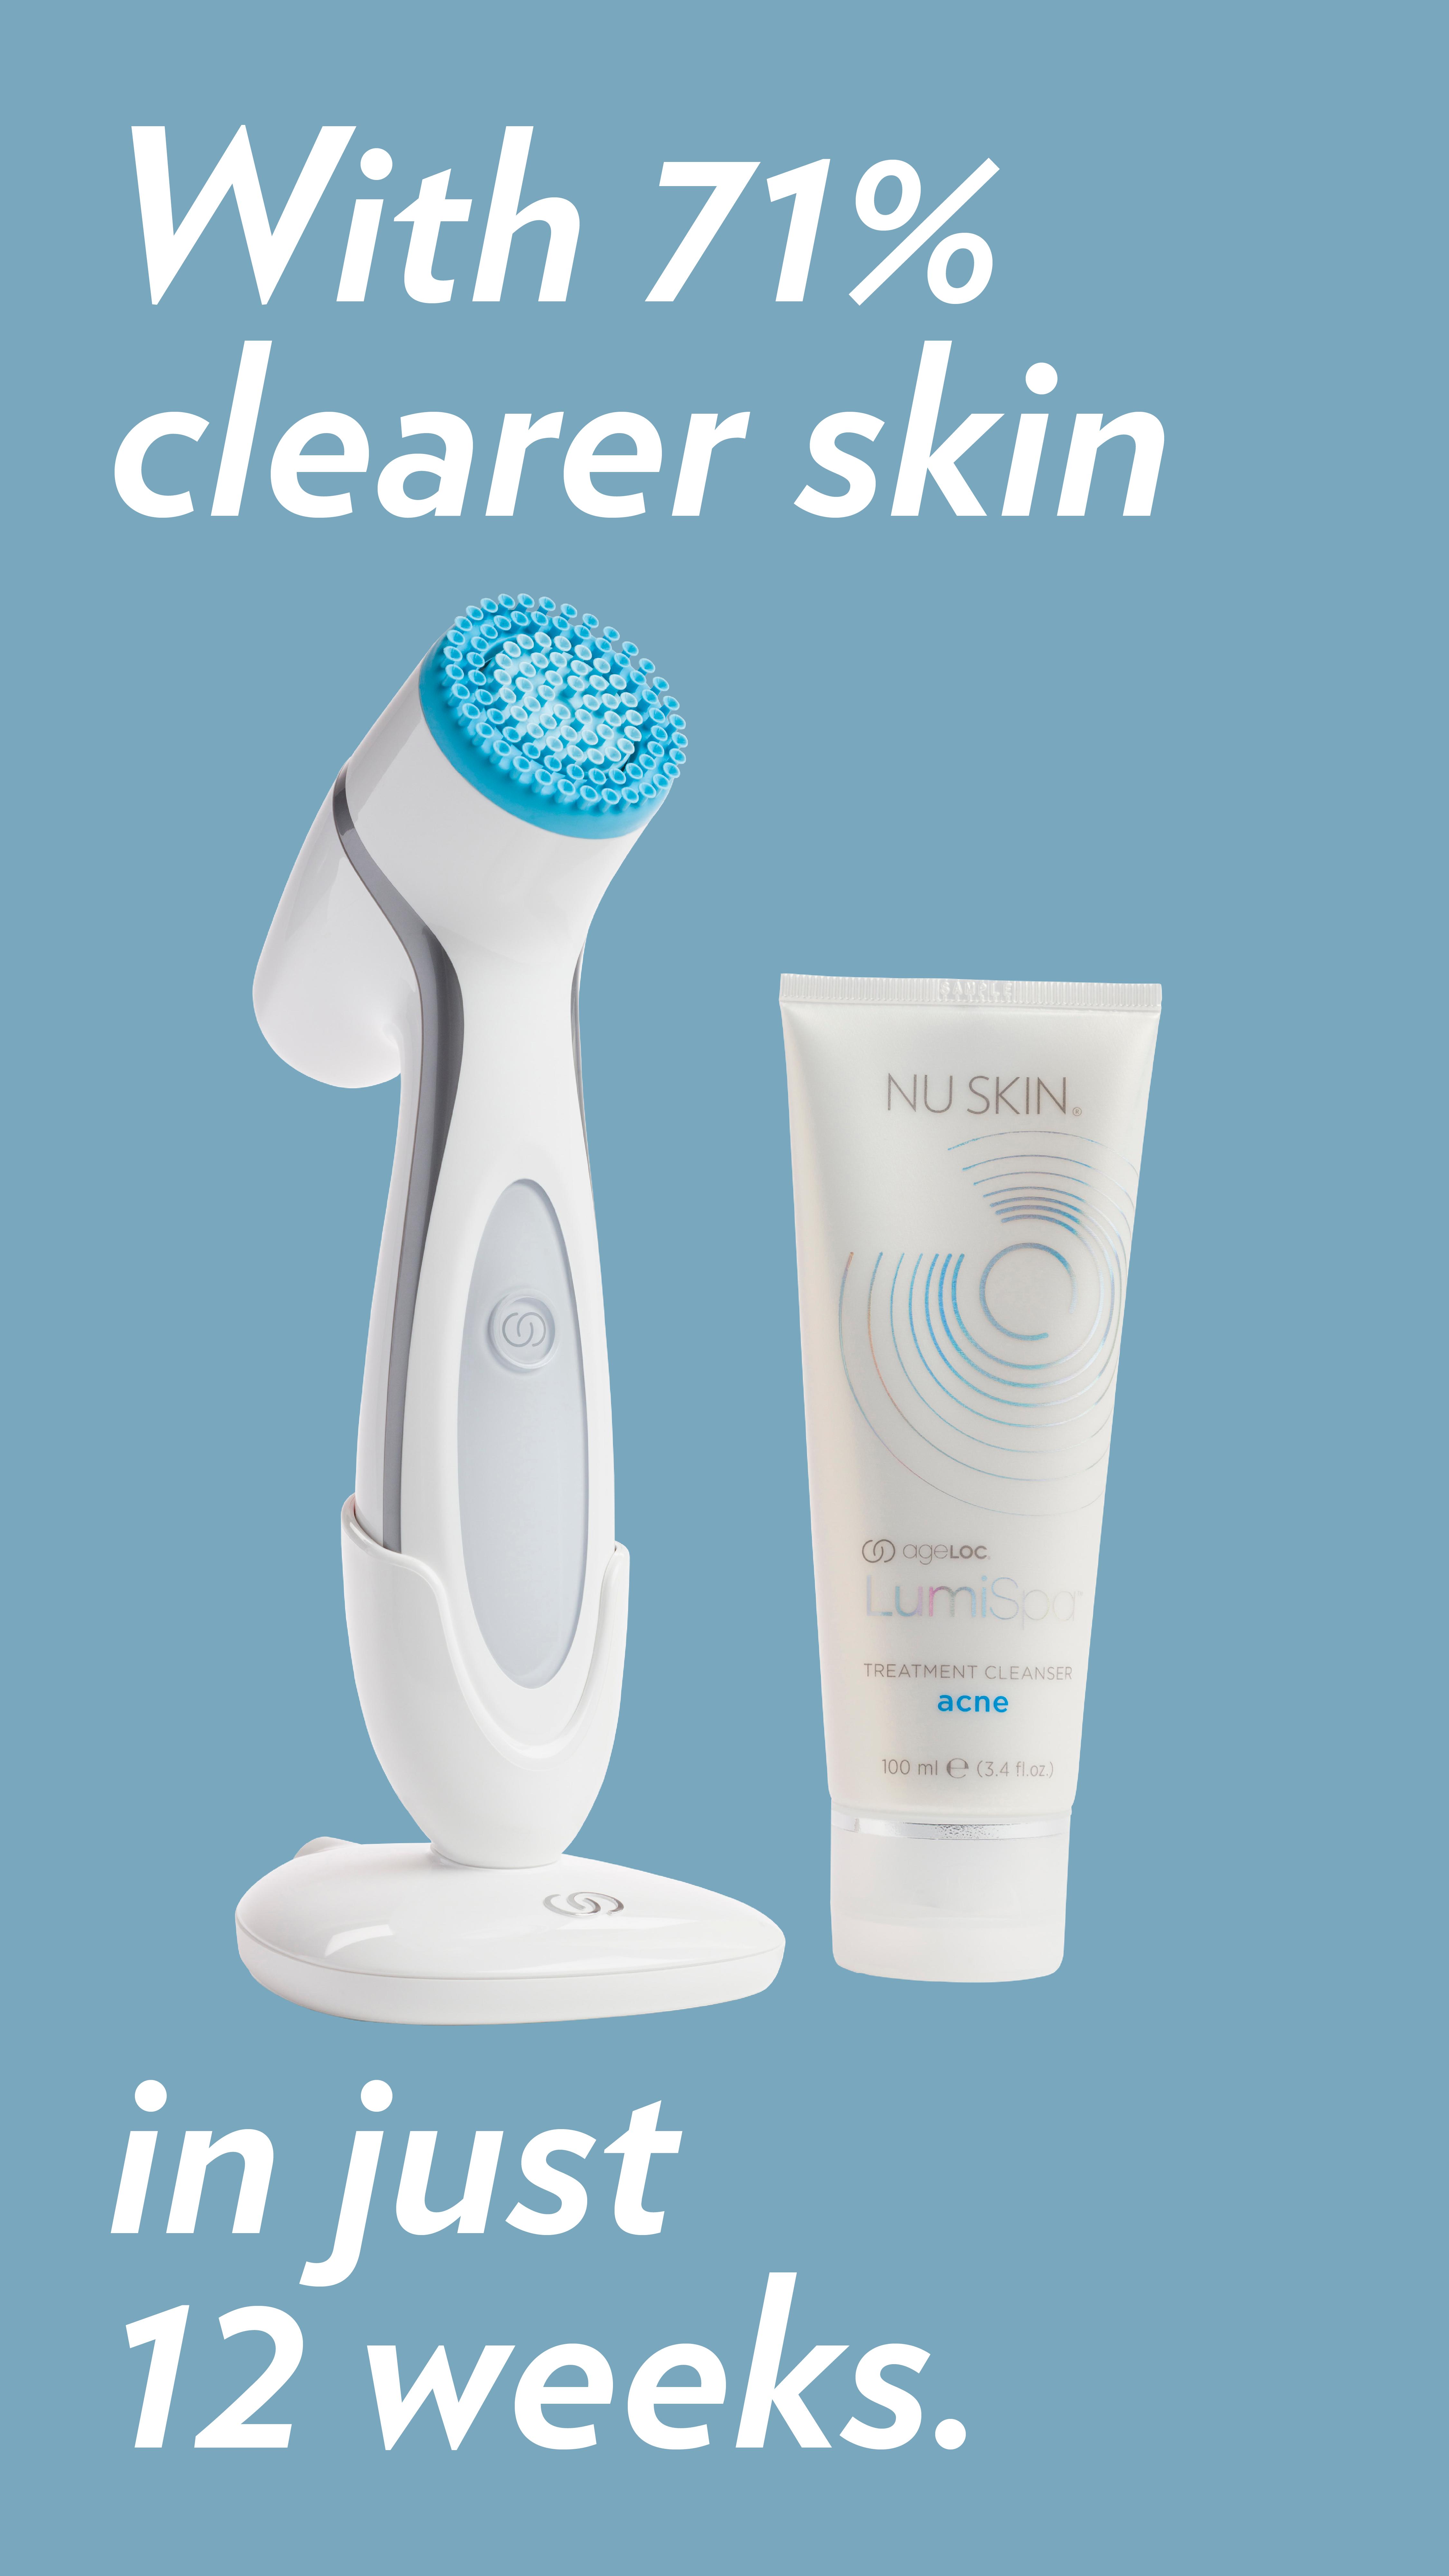 ageLOC® Lumispa® in 2020 Skin care, Face care tips, Face